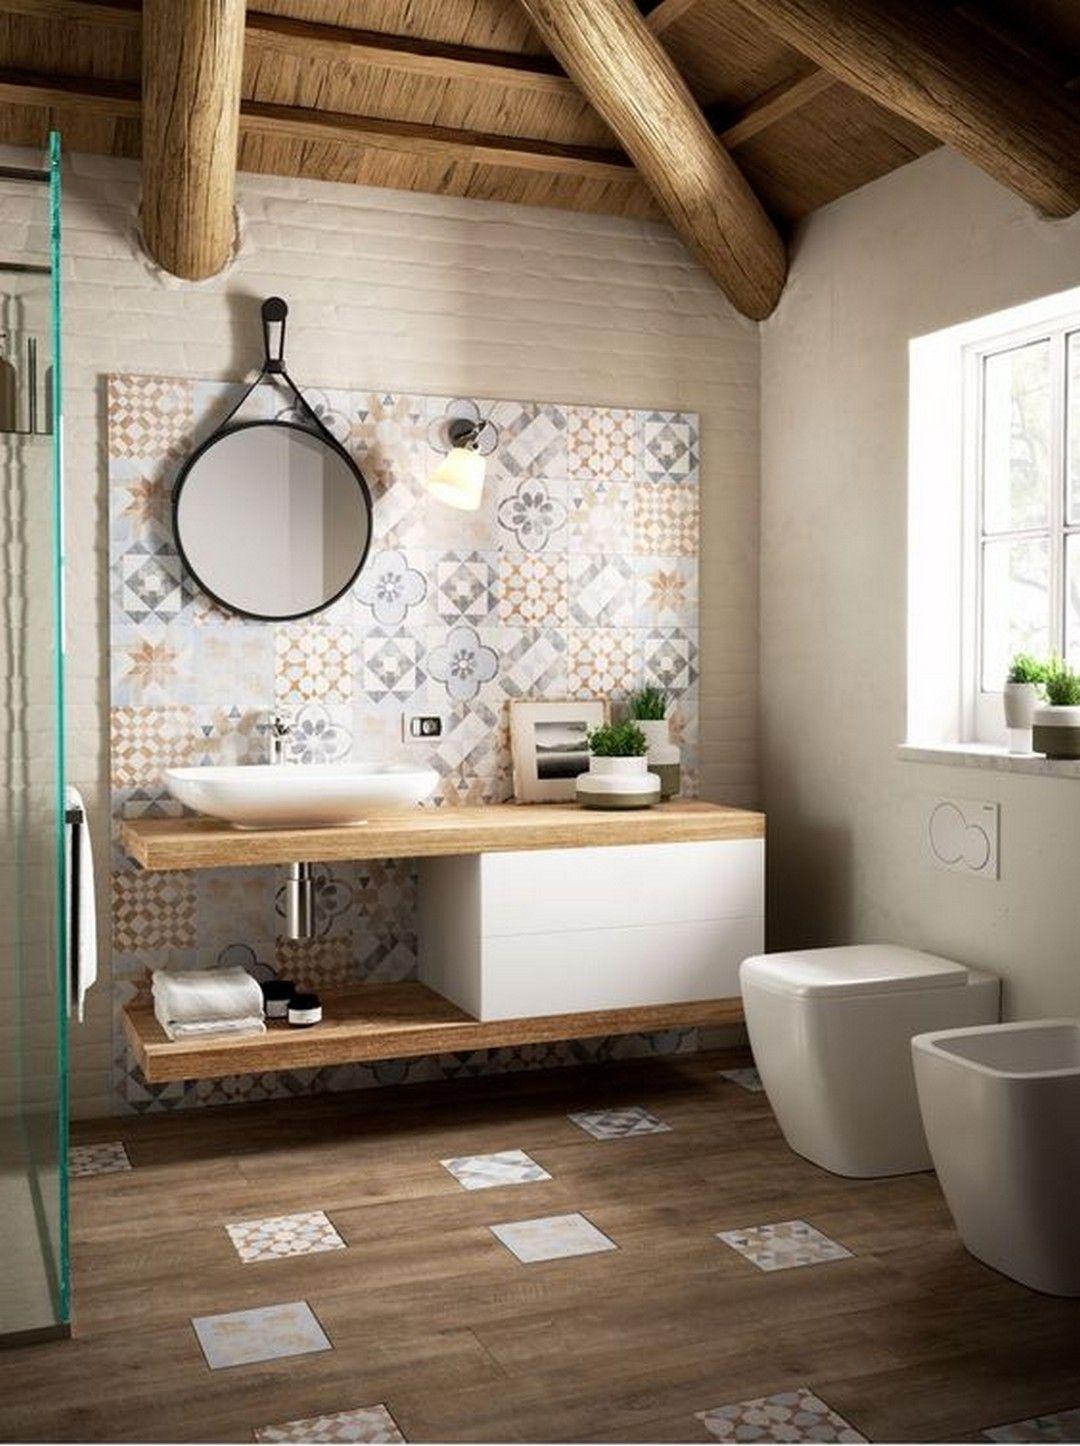 Beautiful And Magnificent Looks Of Period Bathroom Designs Goodnewsarchitecture Bathroom Beautiful In 2020 Badezimmer Design Badezimmer Innenausstattung Badezimmer